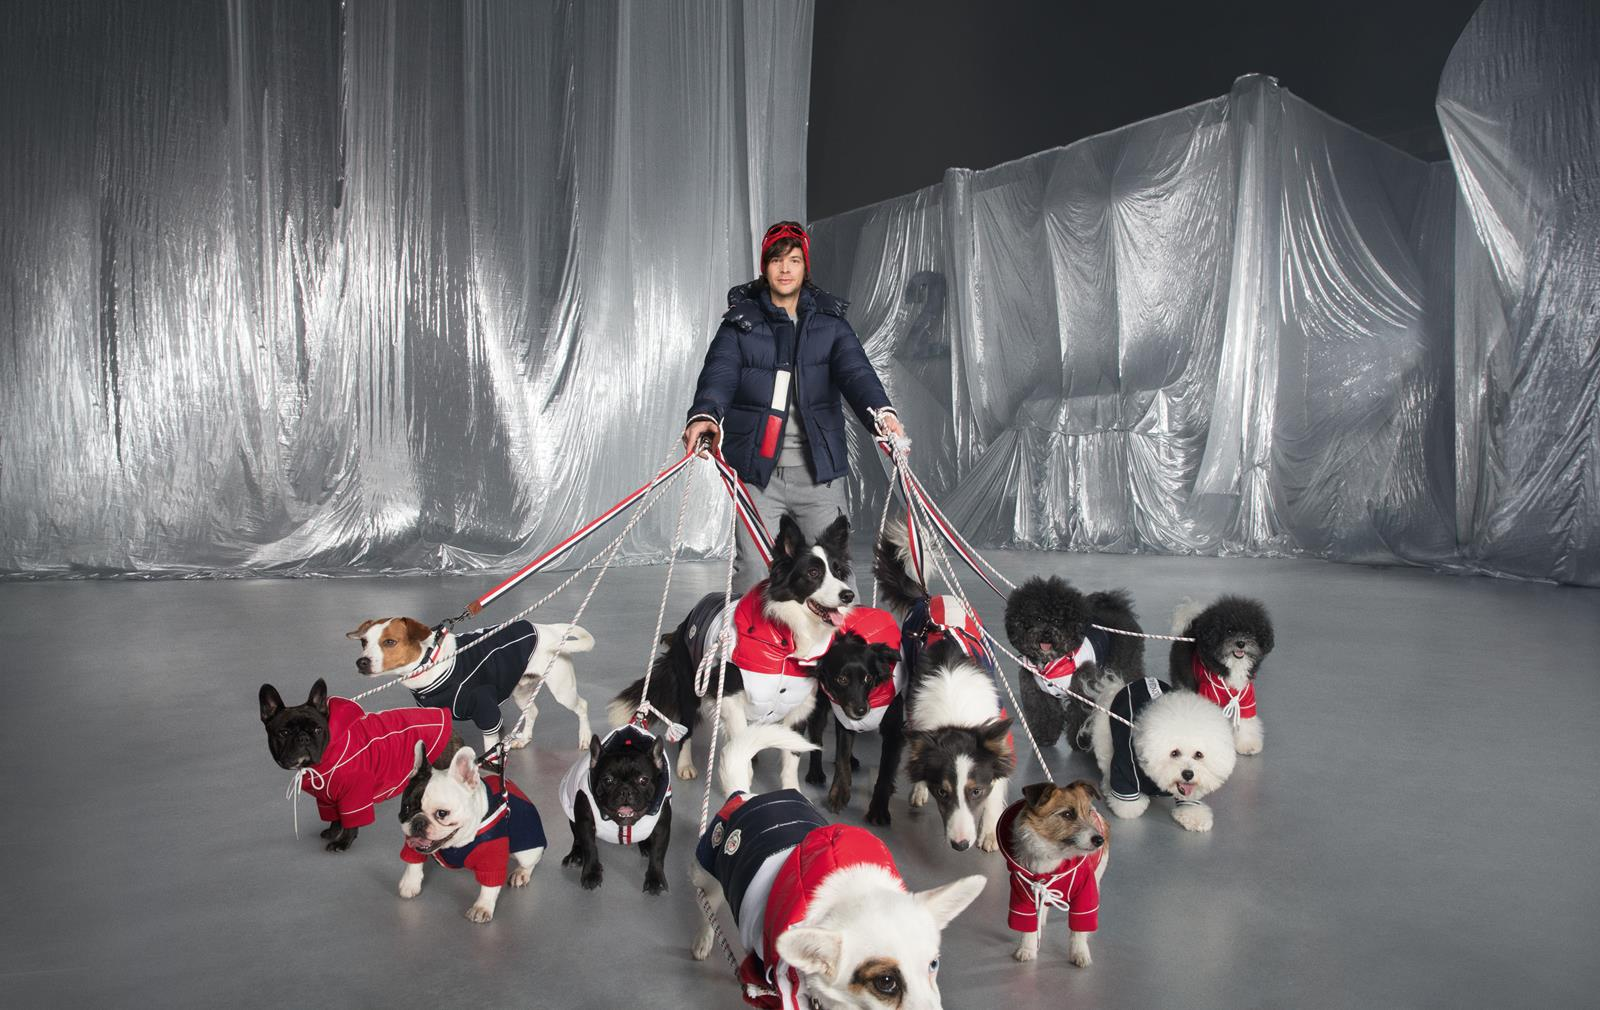 moncler abbigliamento cane inverno